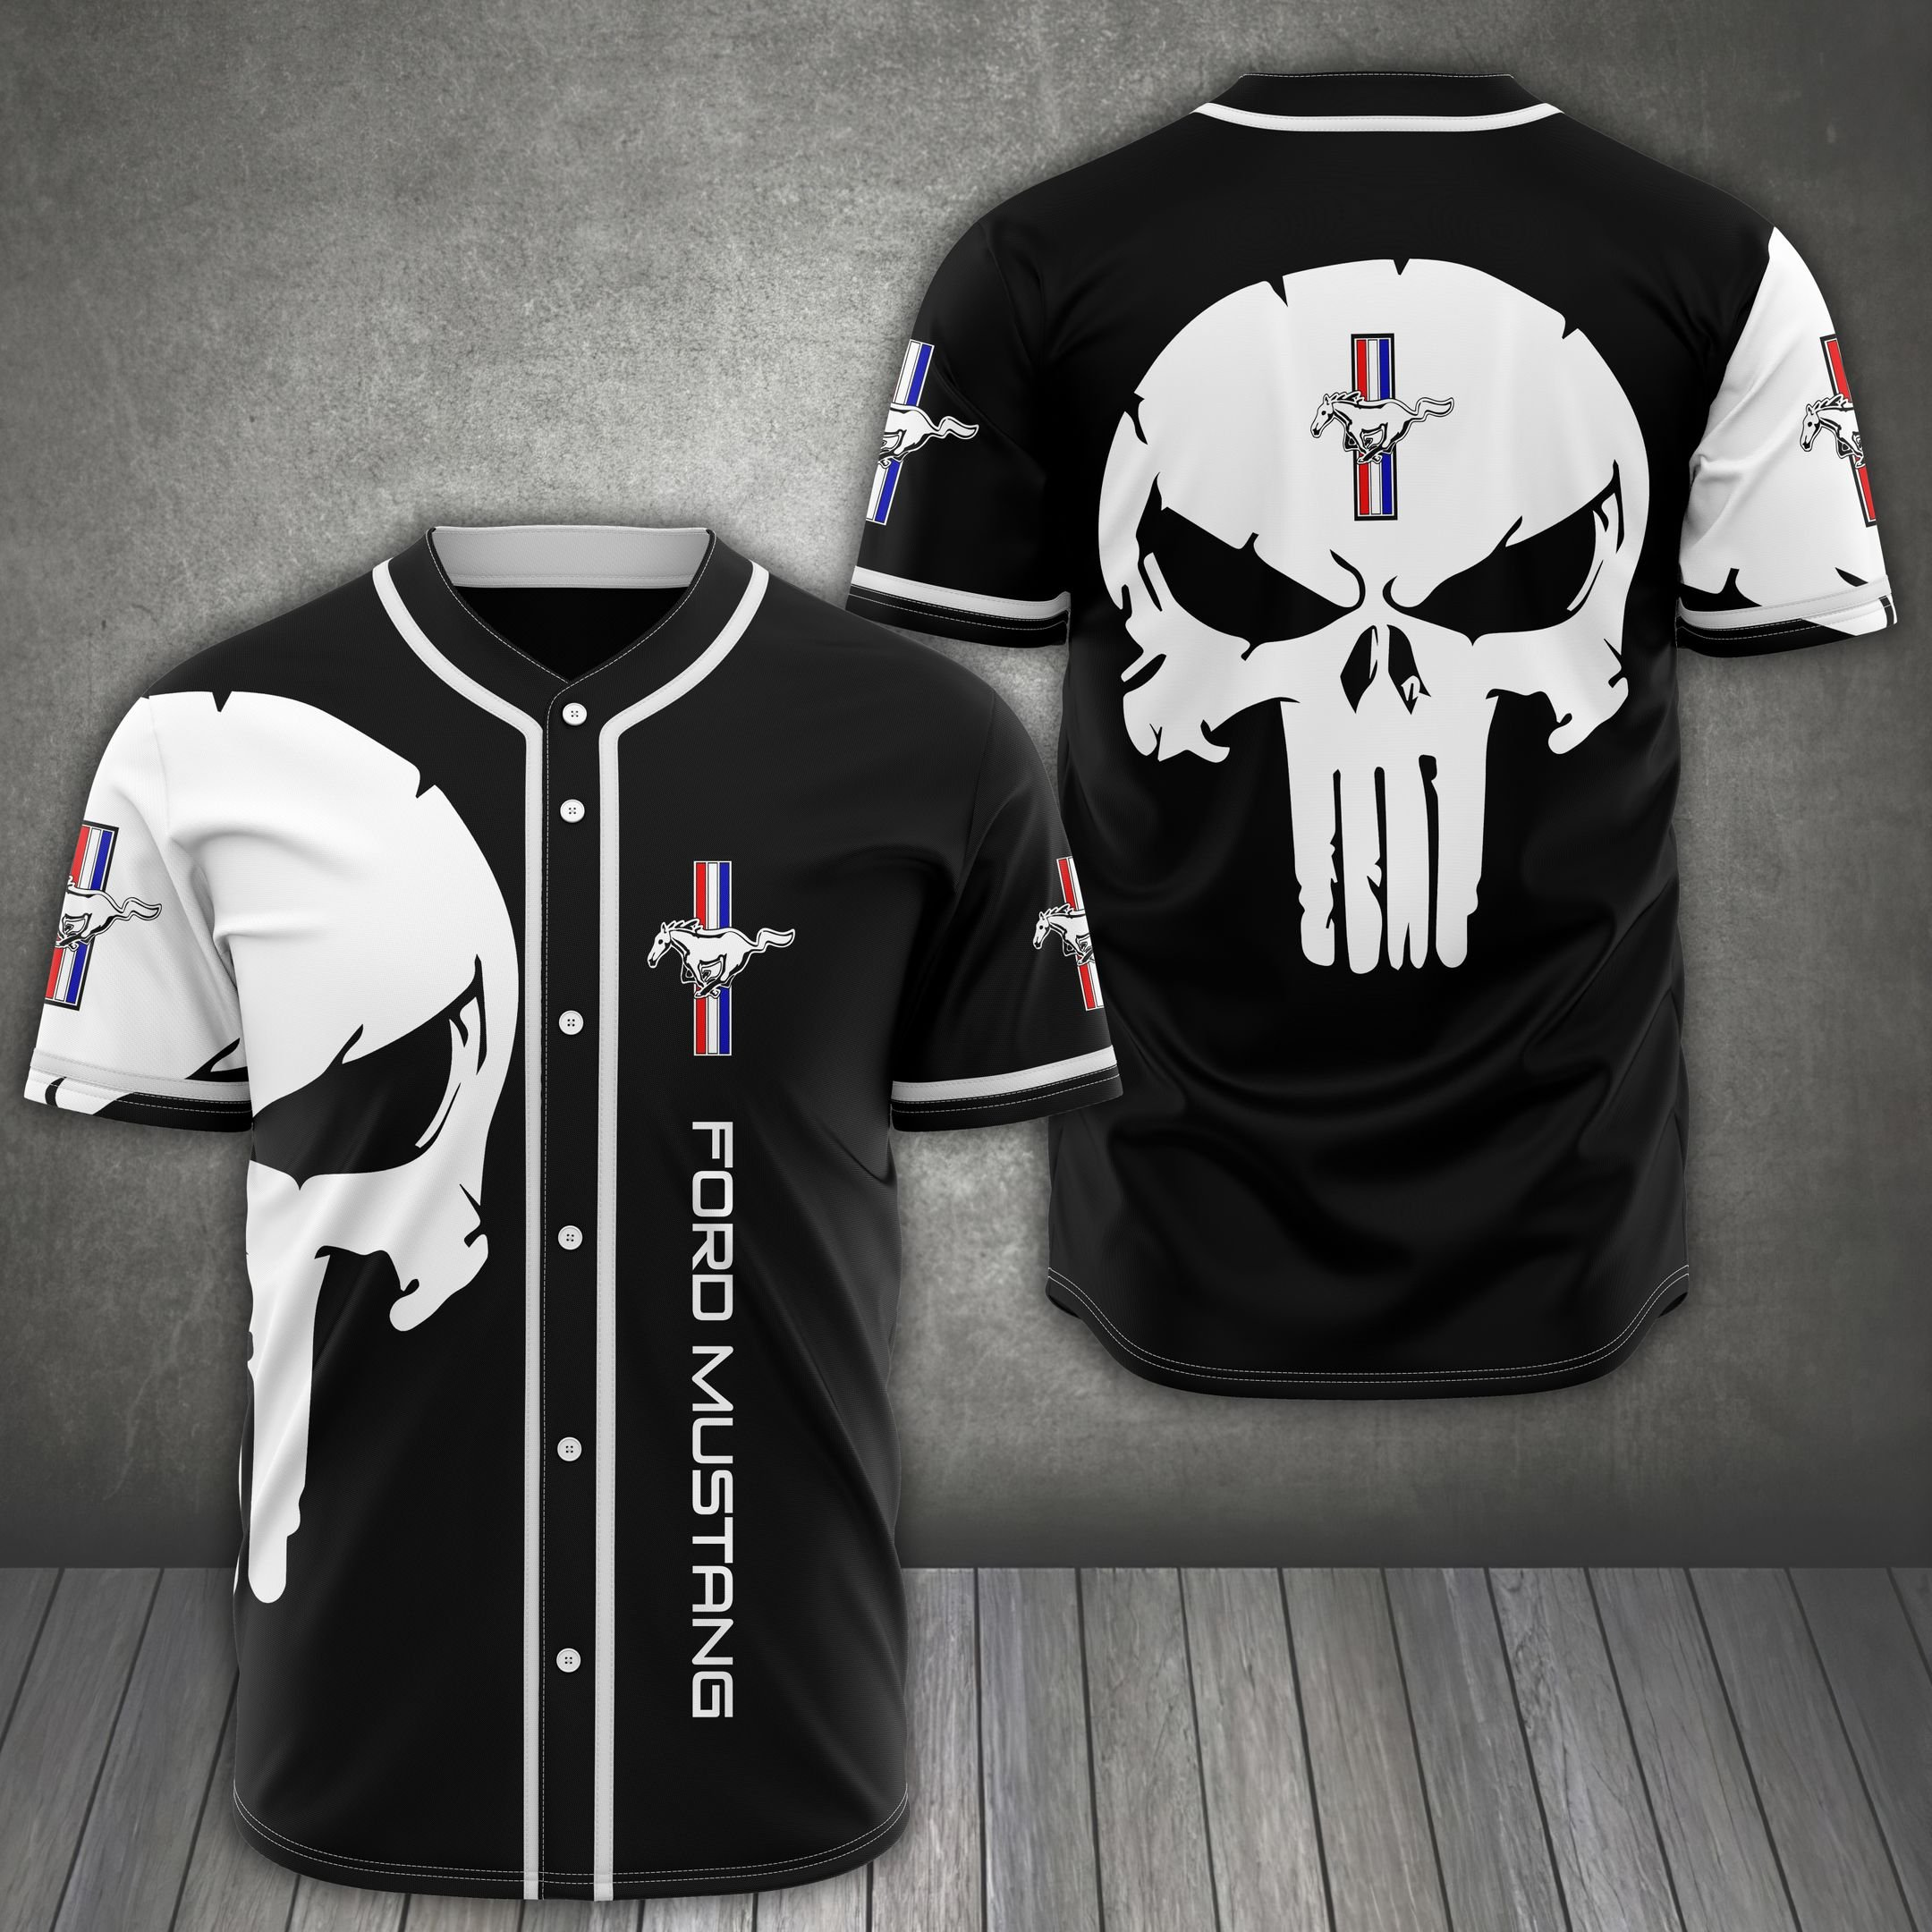 Ford Mustang skull black Baseball Jersey Shirt